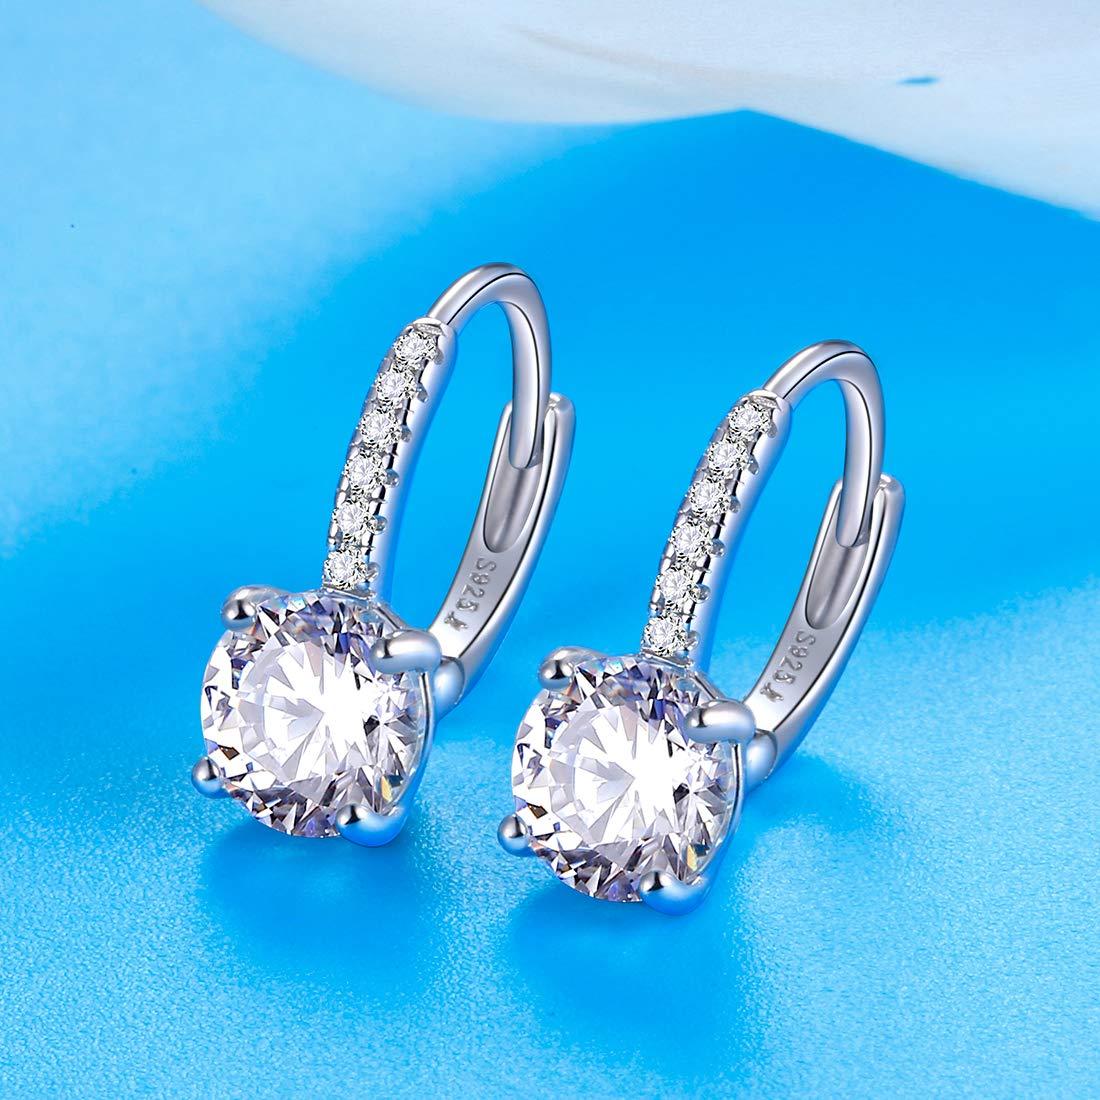 Pegaffi Round Cubic Zirconia Drop Dangle Earrings for Women Jewelry